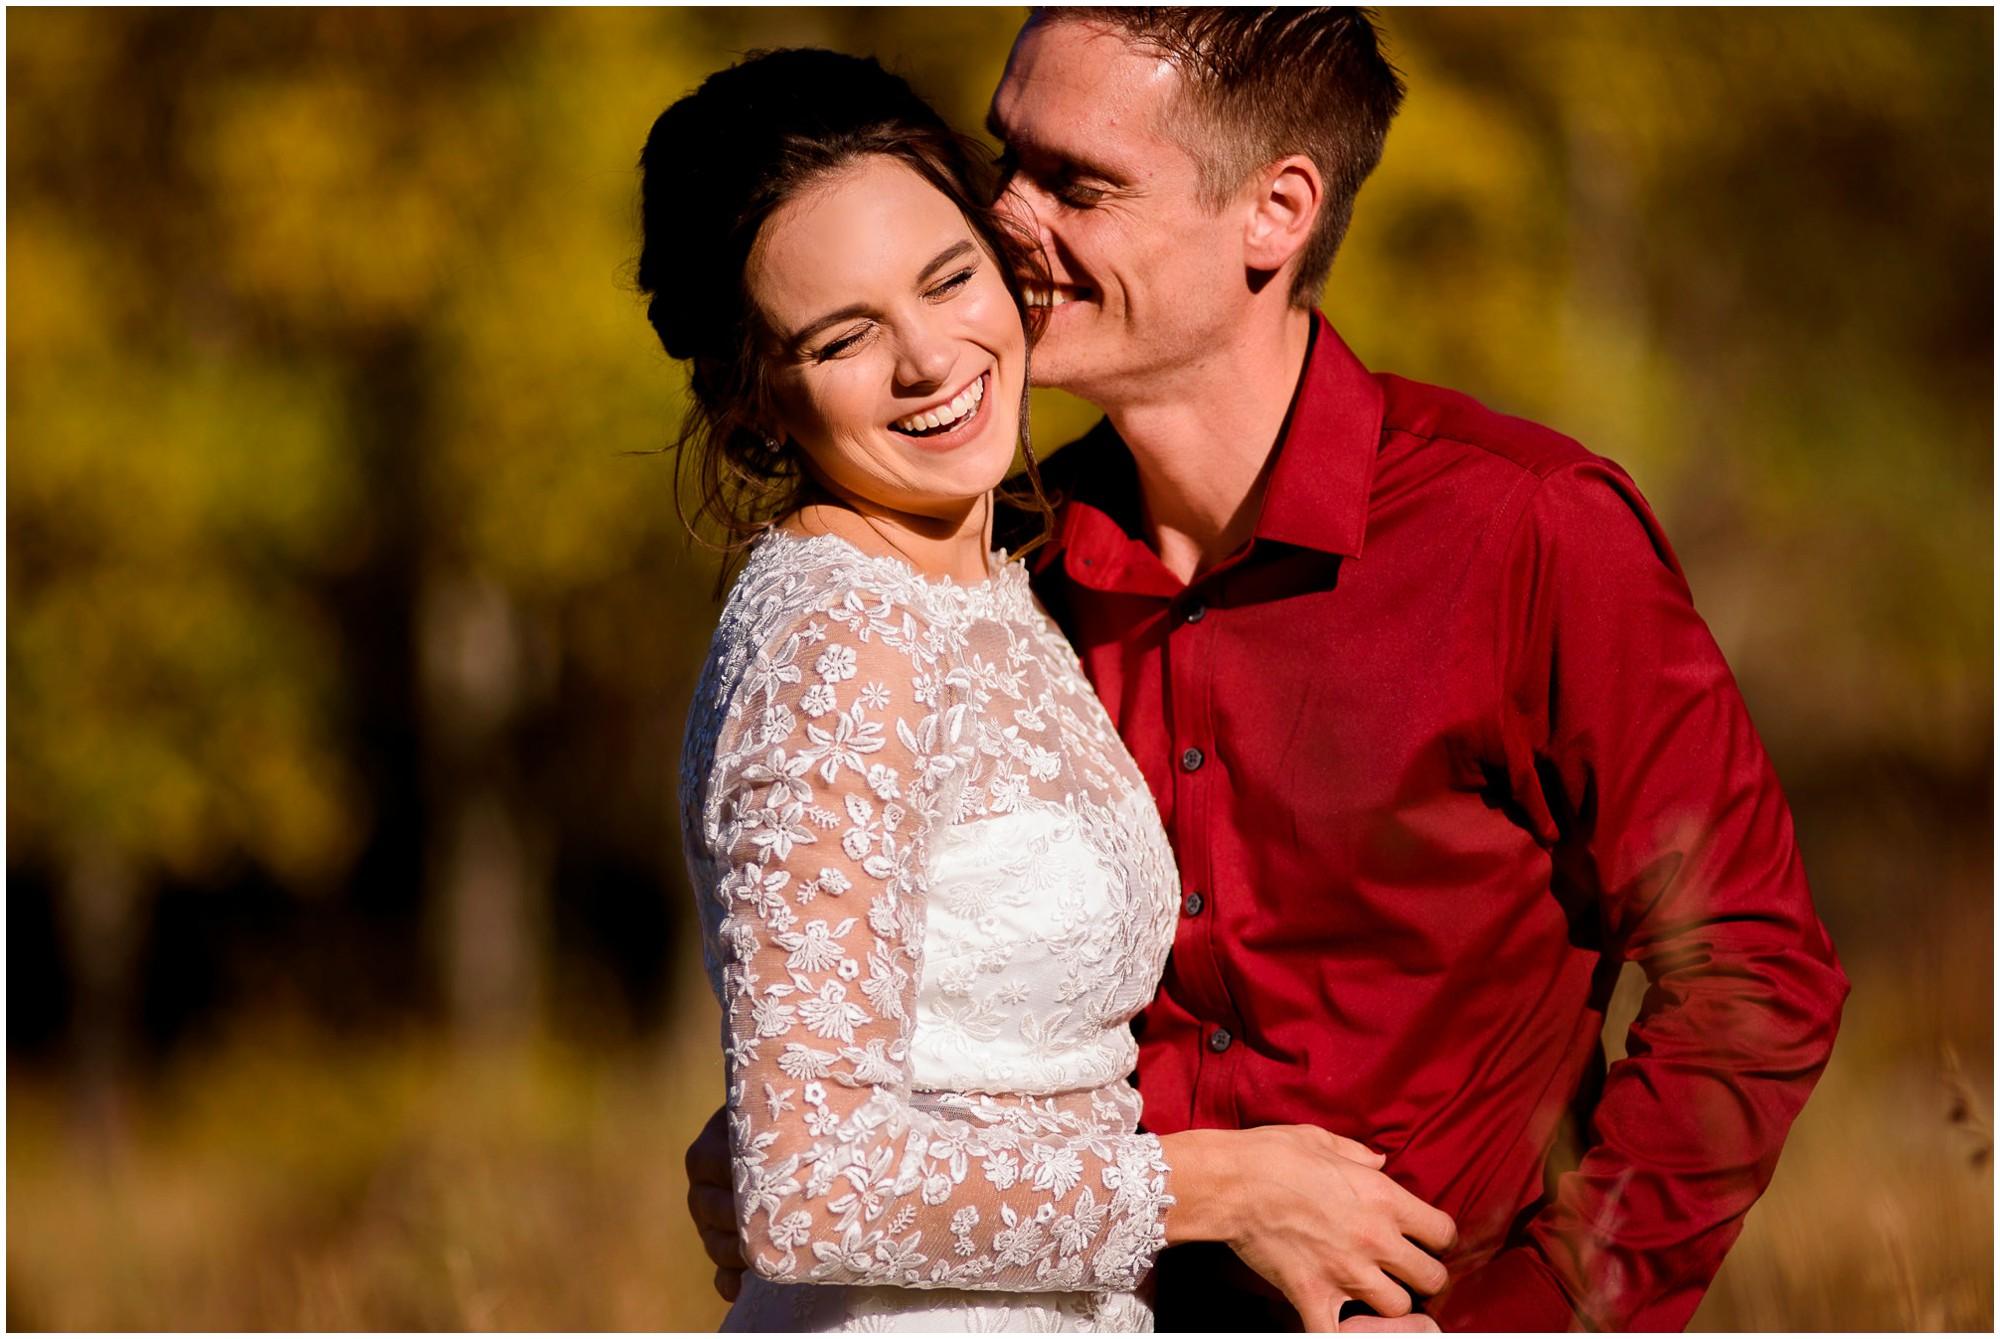 Fall wedding portrait in Estes Park